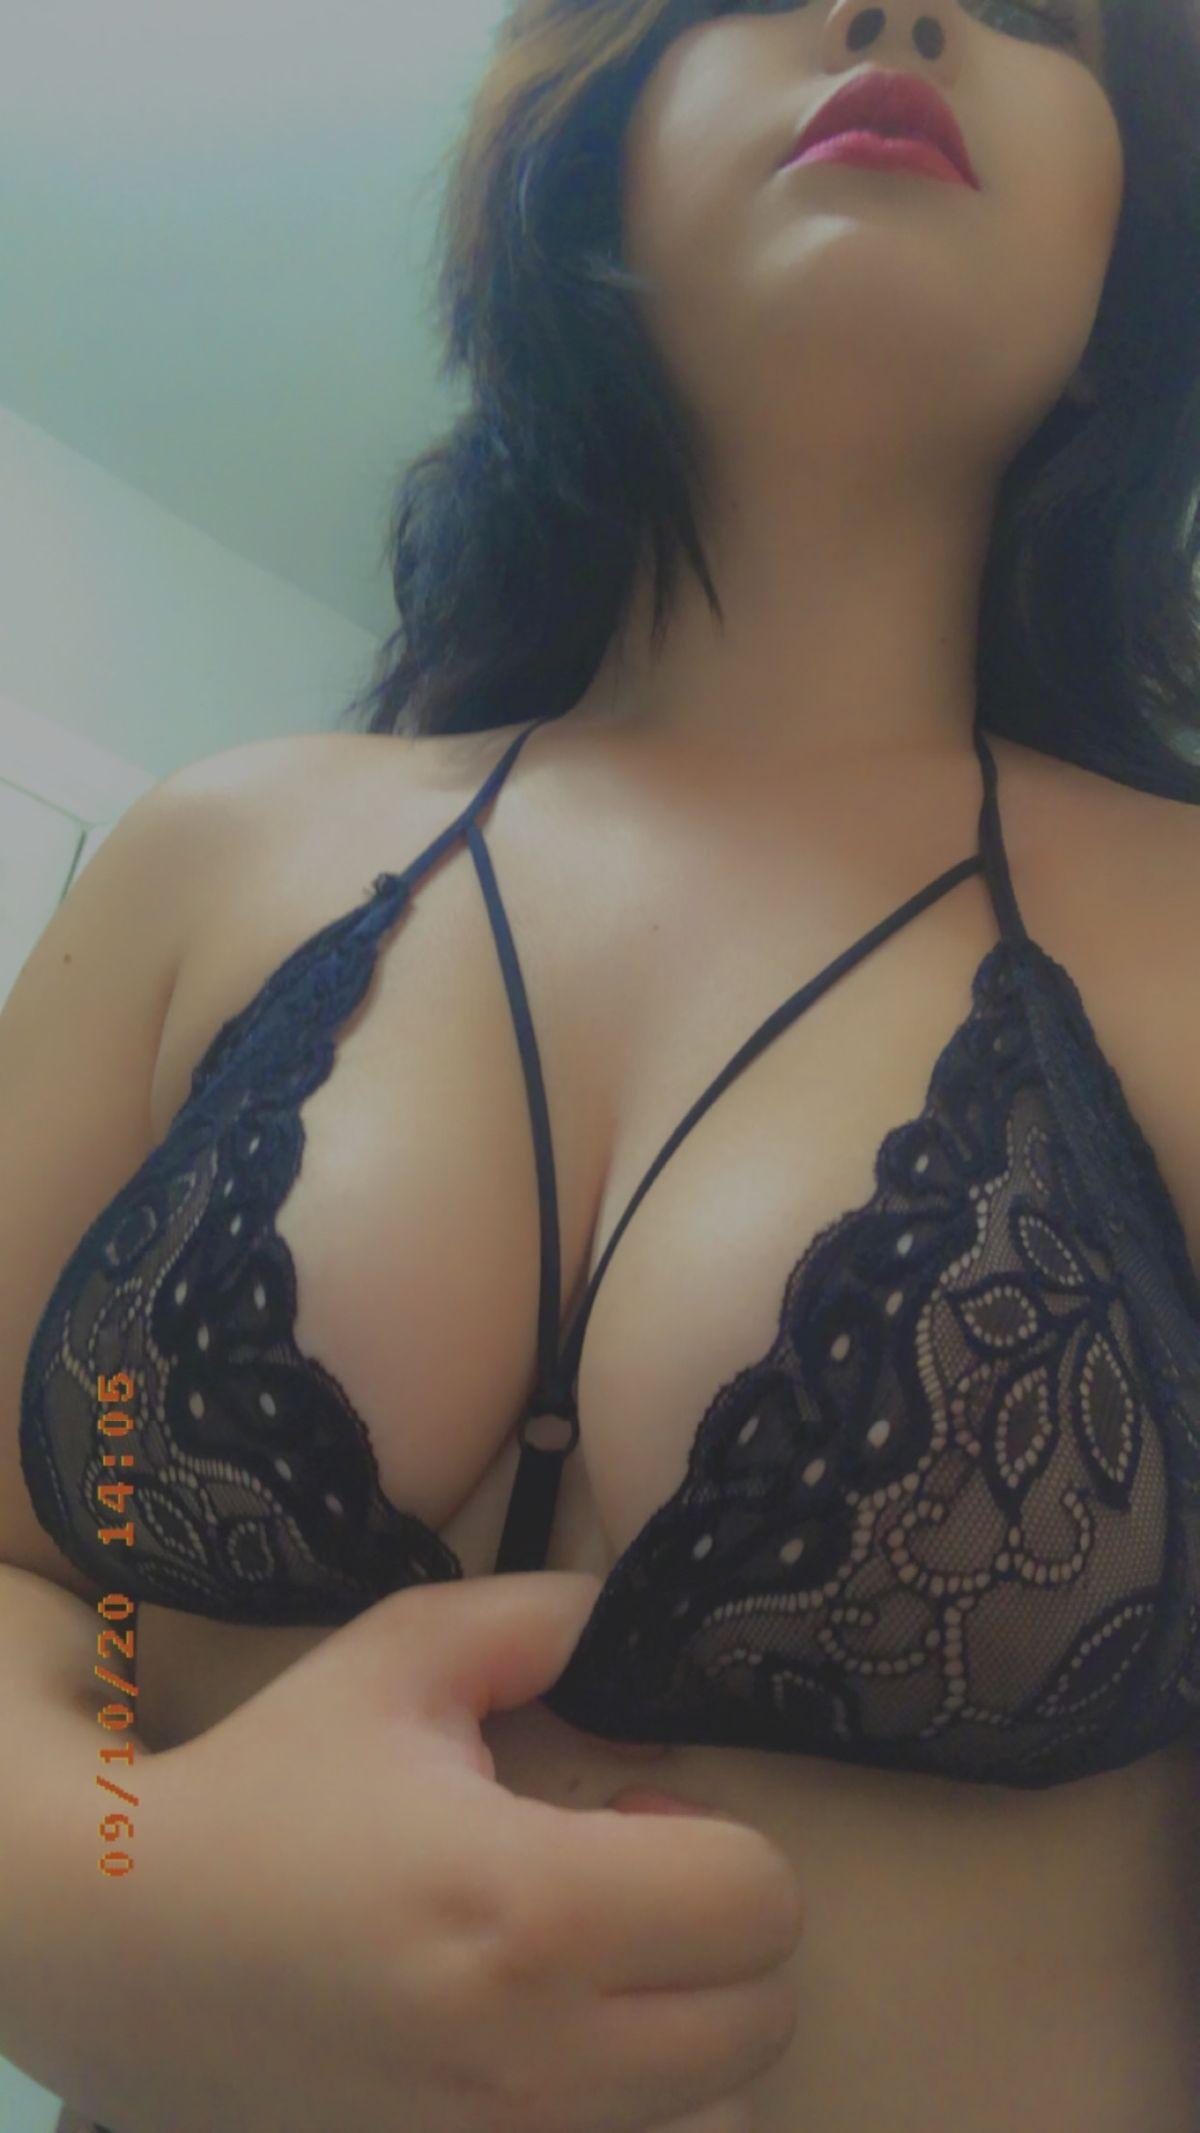 @bonedaddyxo